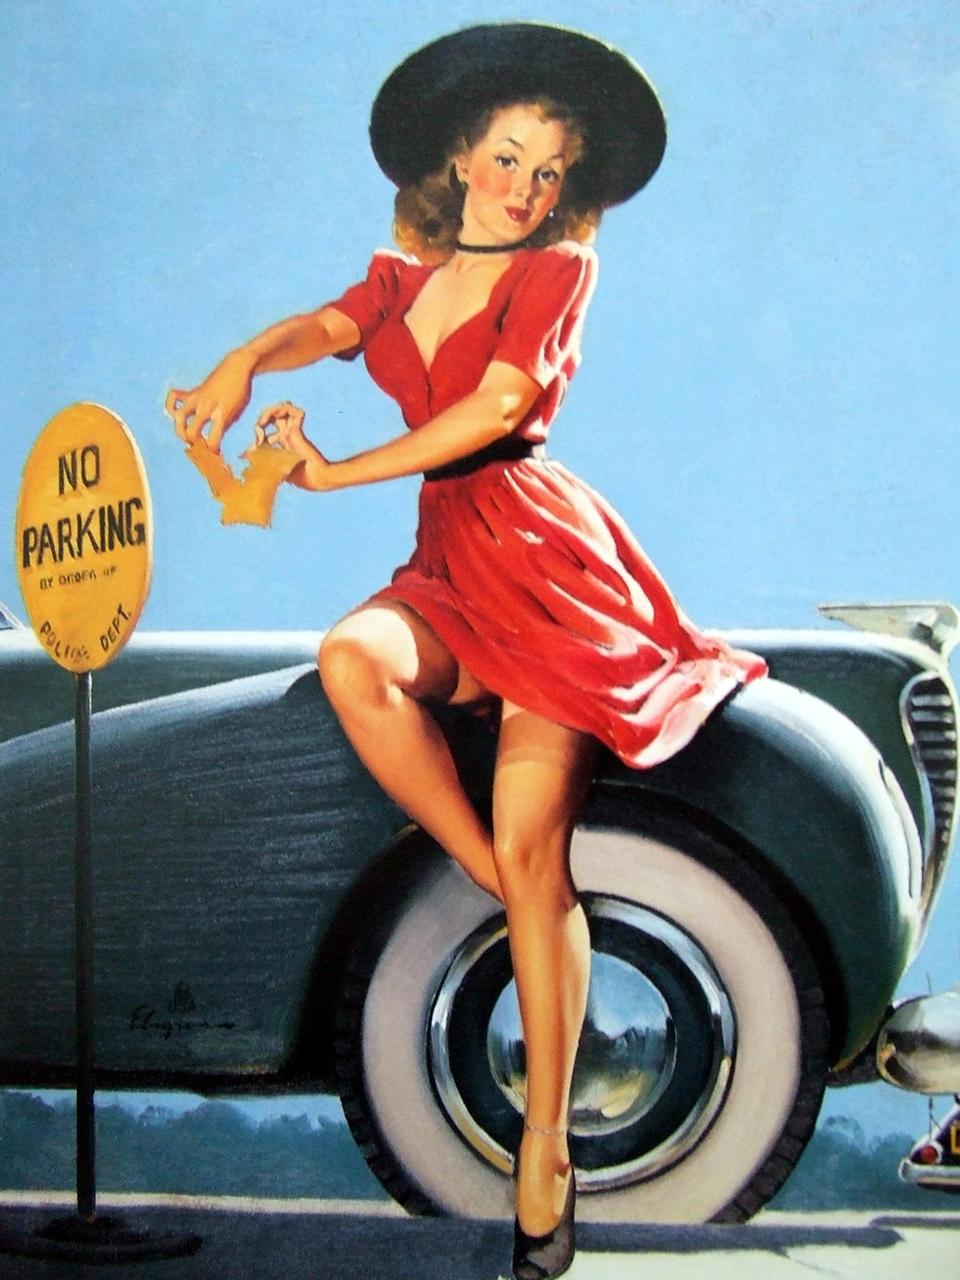 Постер на подрамнике Джил Элвгрен: Nobody can pinch me